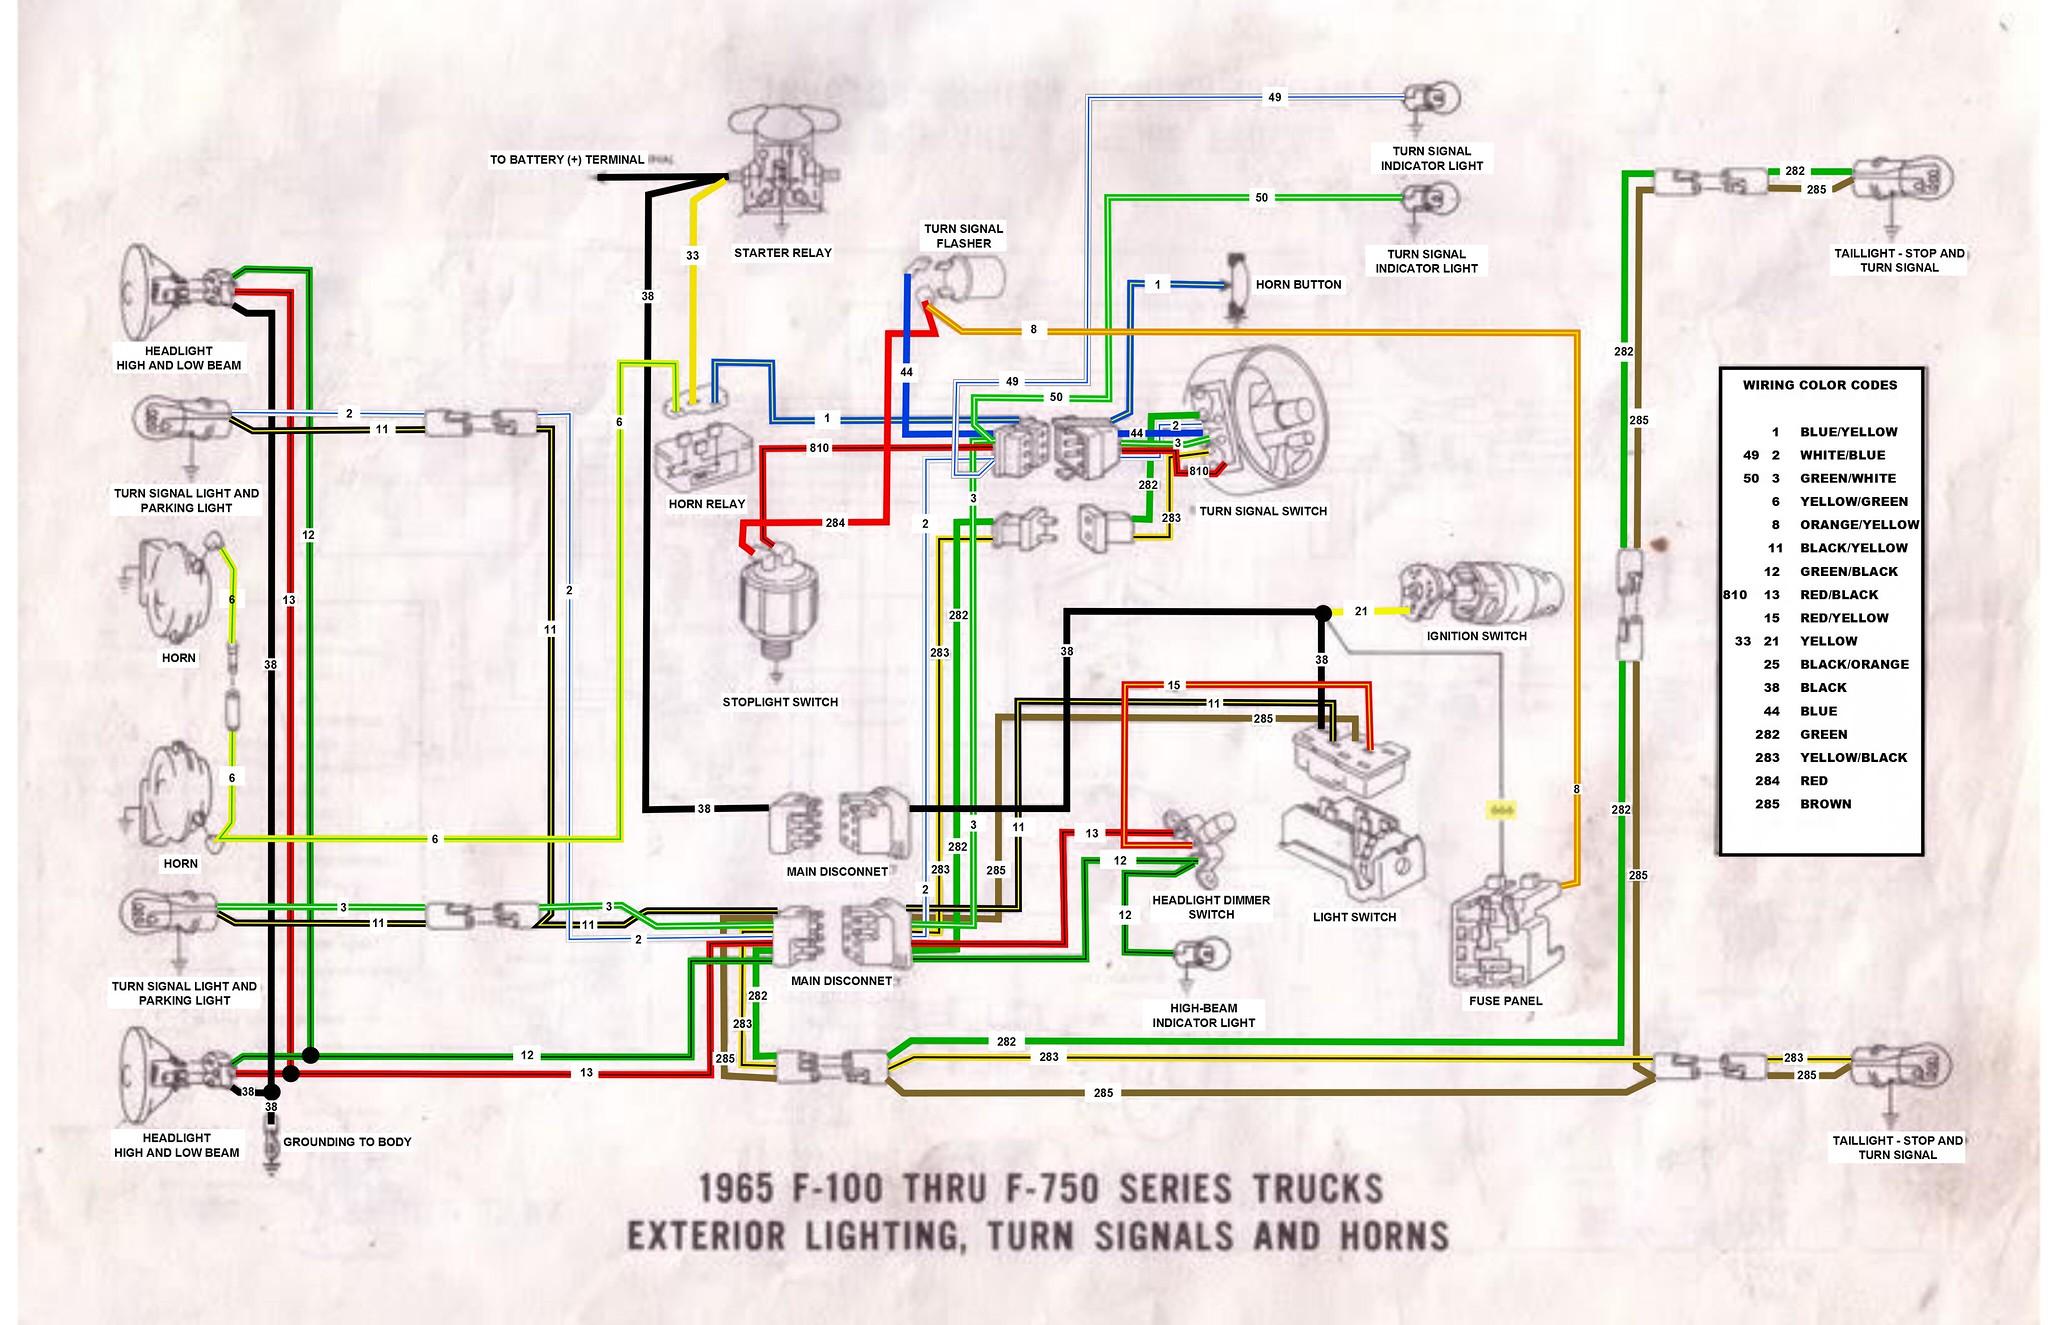 65 F100 Thru F750 Exterior Wiring Diagram